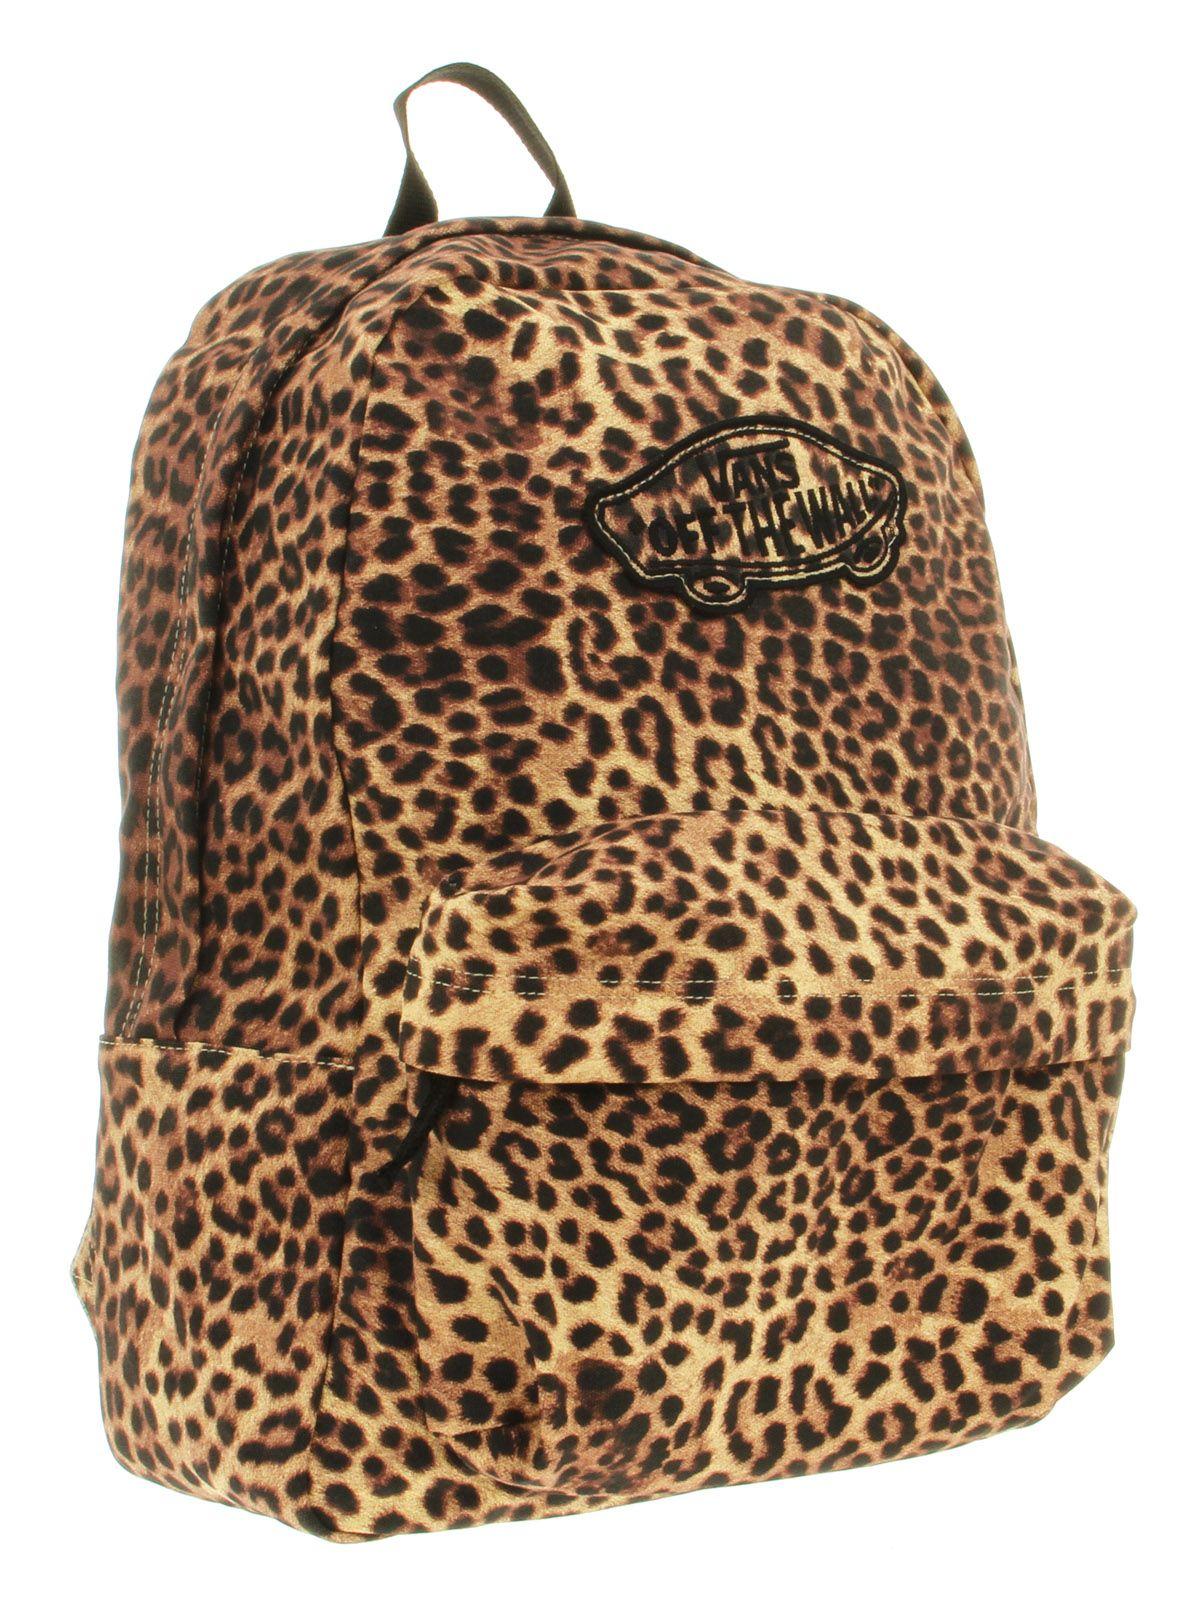 comprar mochila vans leopardo